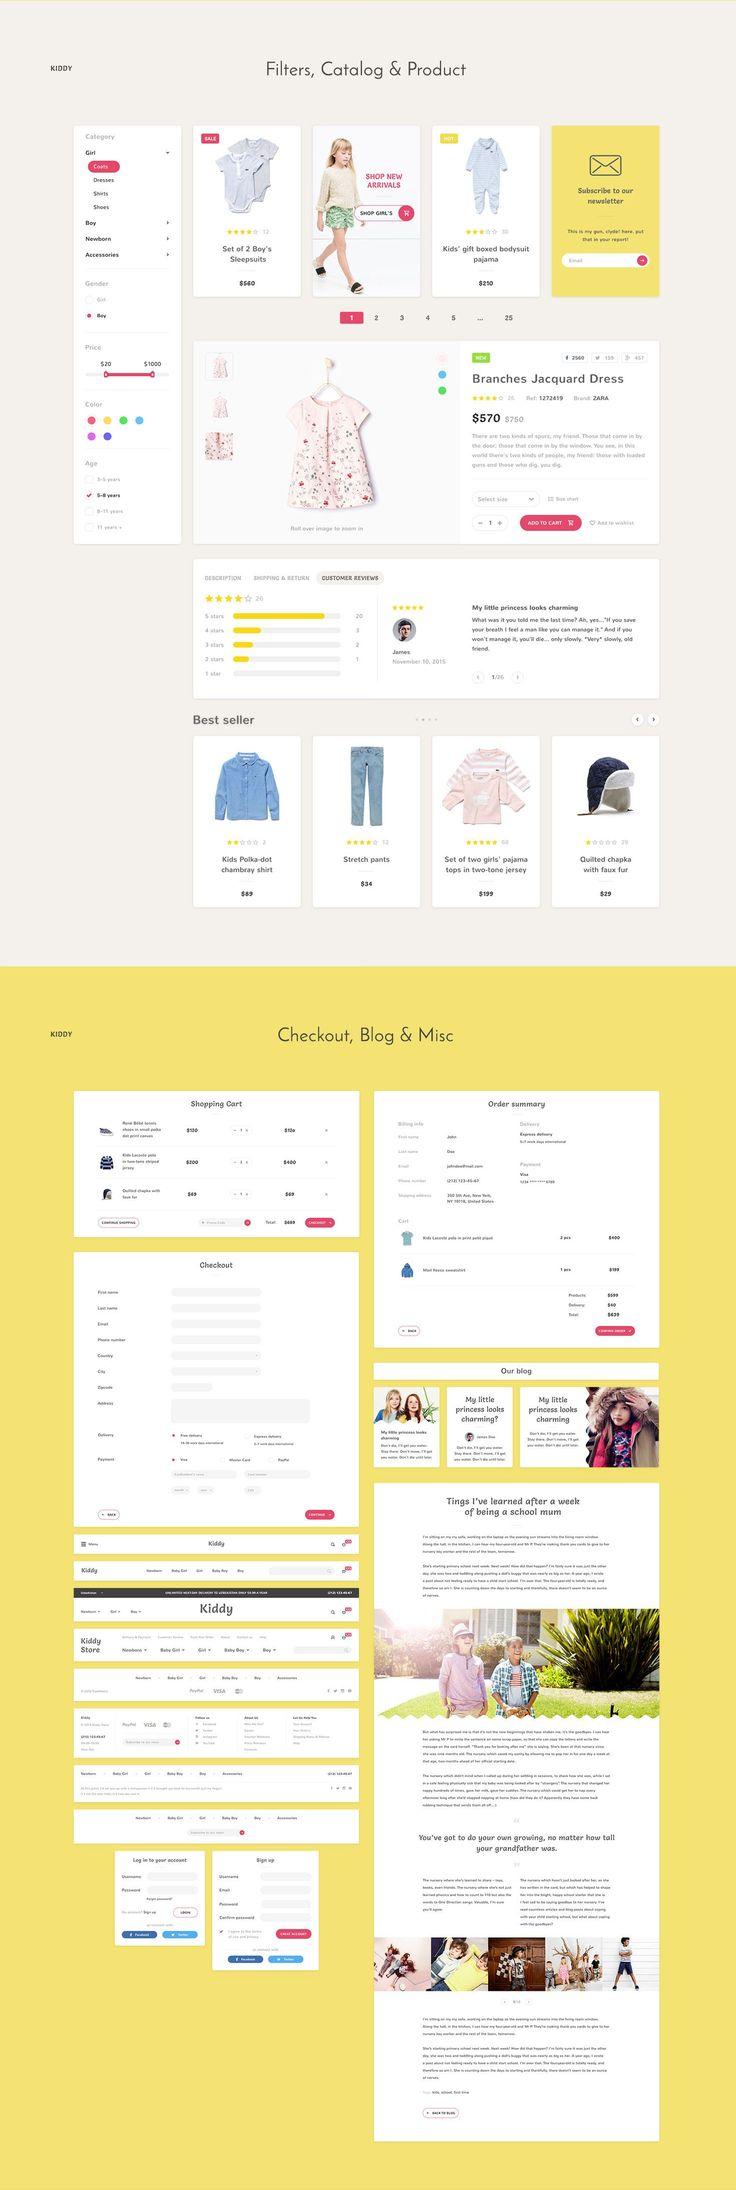 kids store website design | visual hierarchy